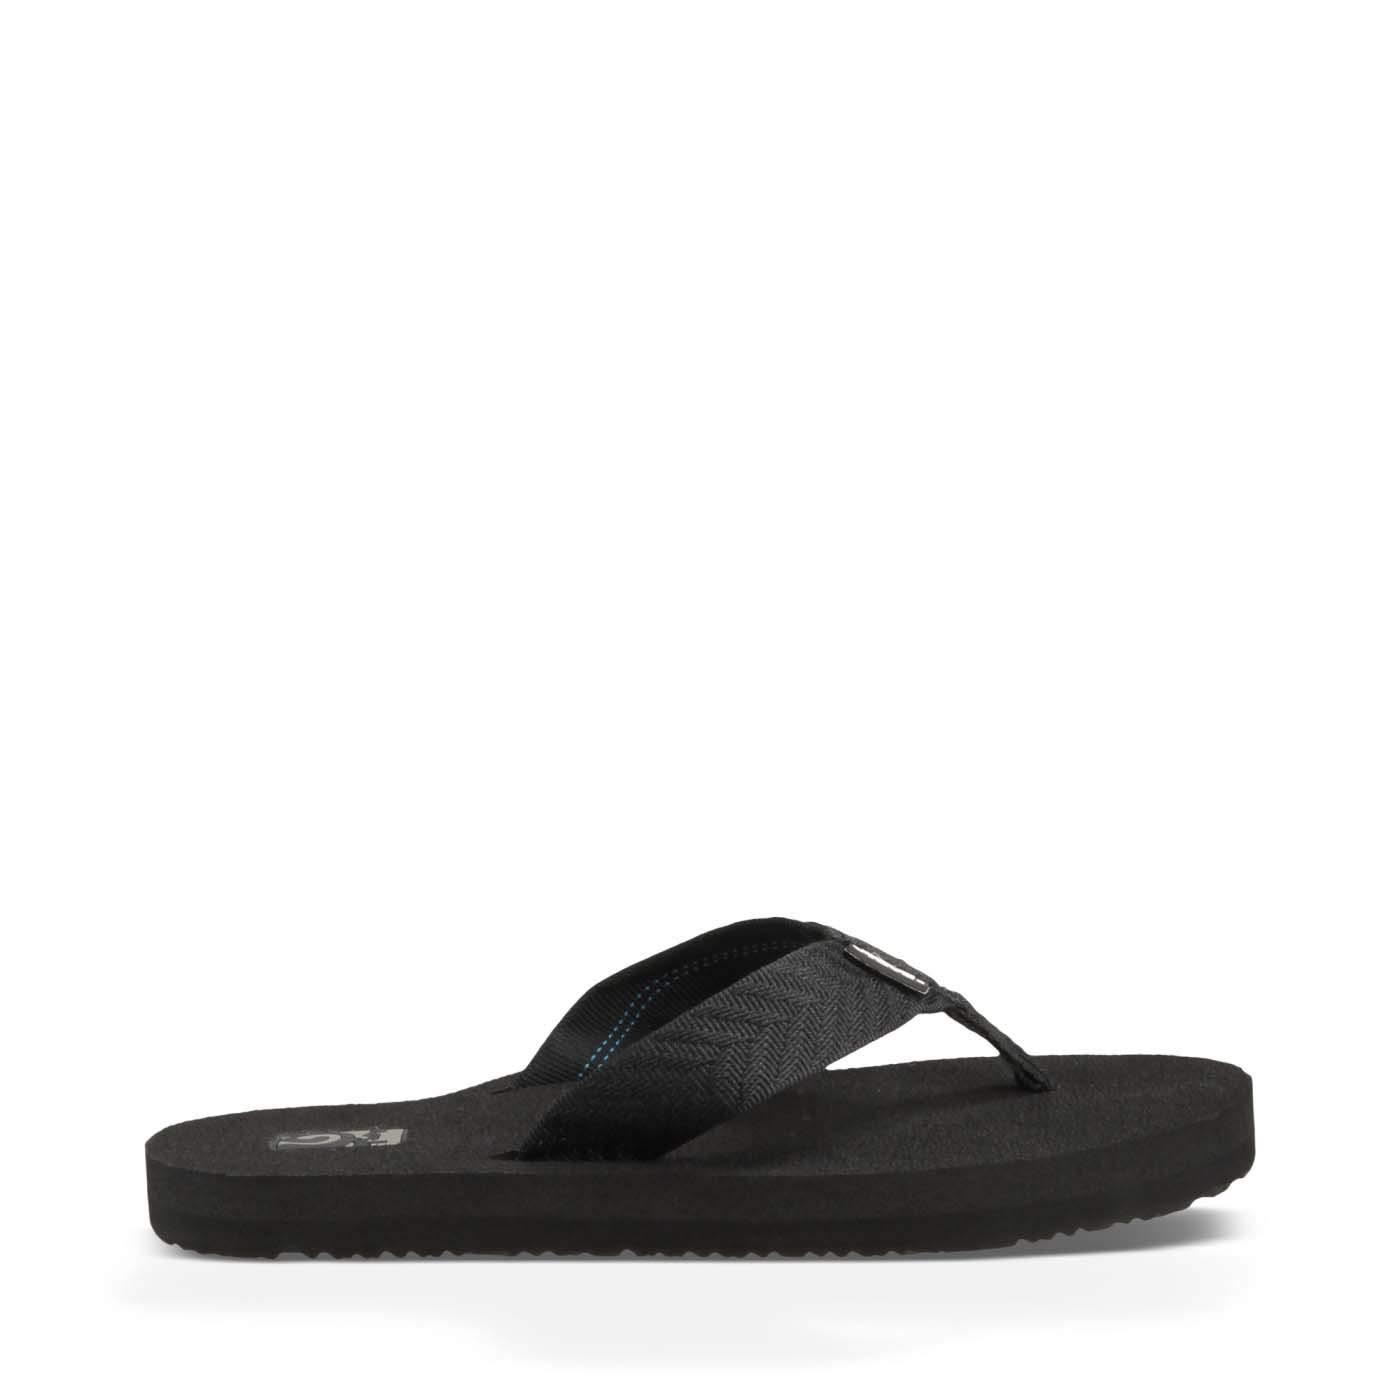 37b47b39c2182 Buy Teva mush II Womens Flip-Flop Sandals (VARIETY Of COLORS   SIZES ...